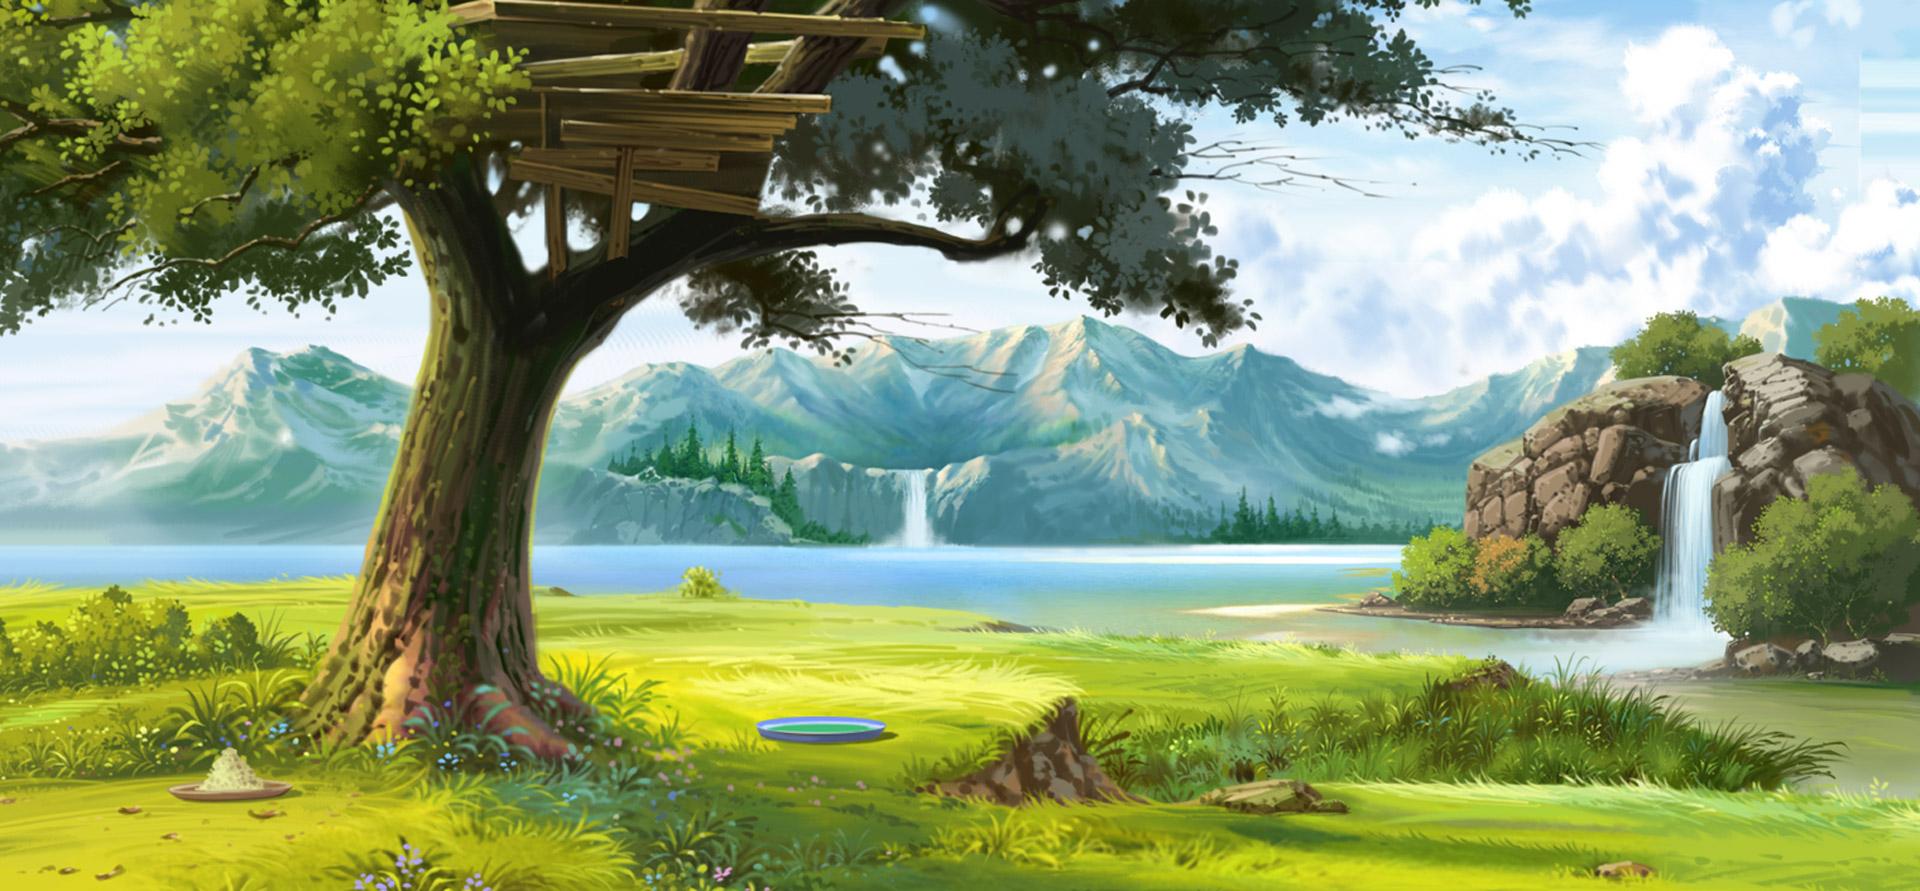 Calendar Templates Html : Animation background game scenes beautiful